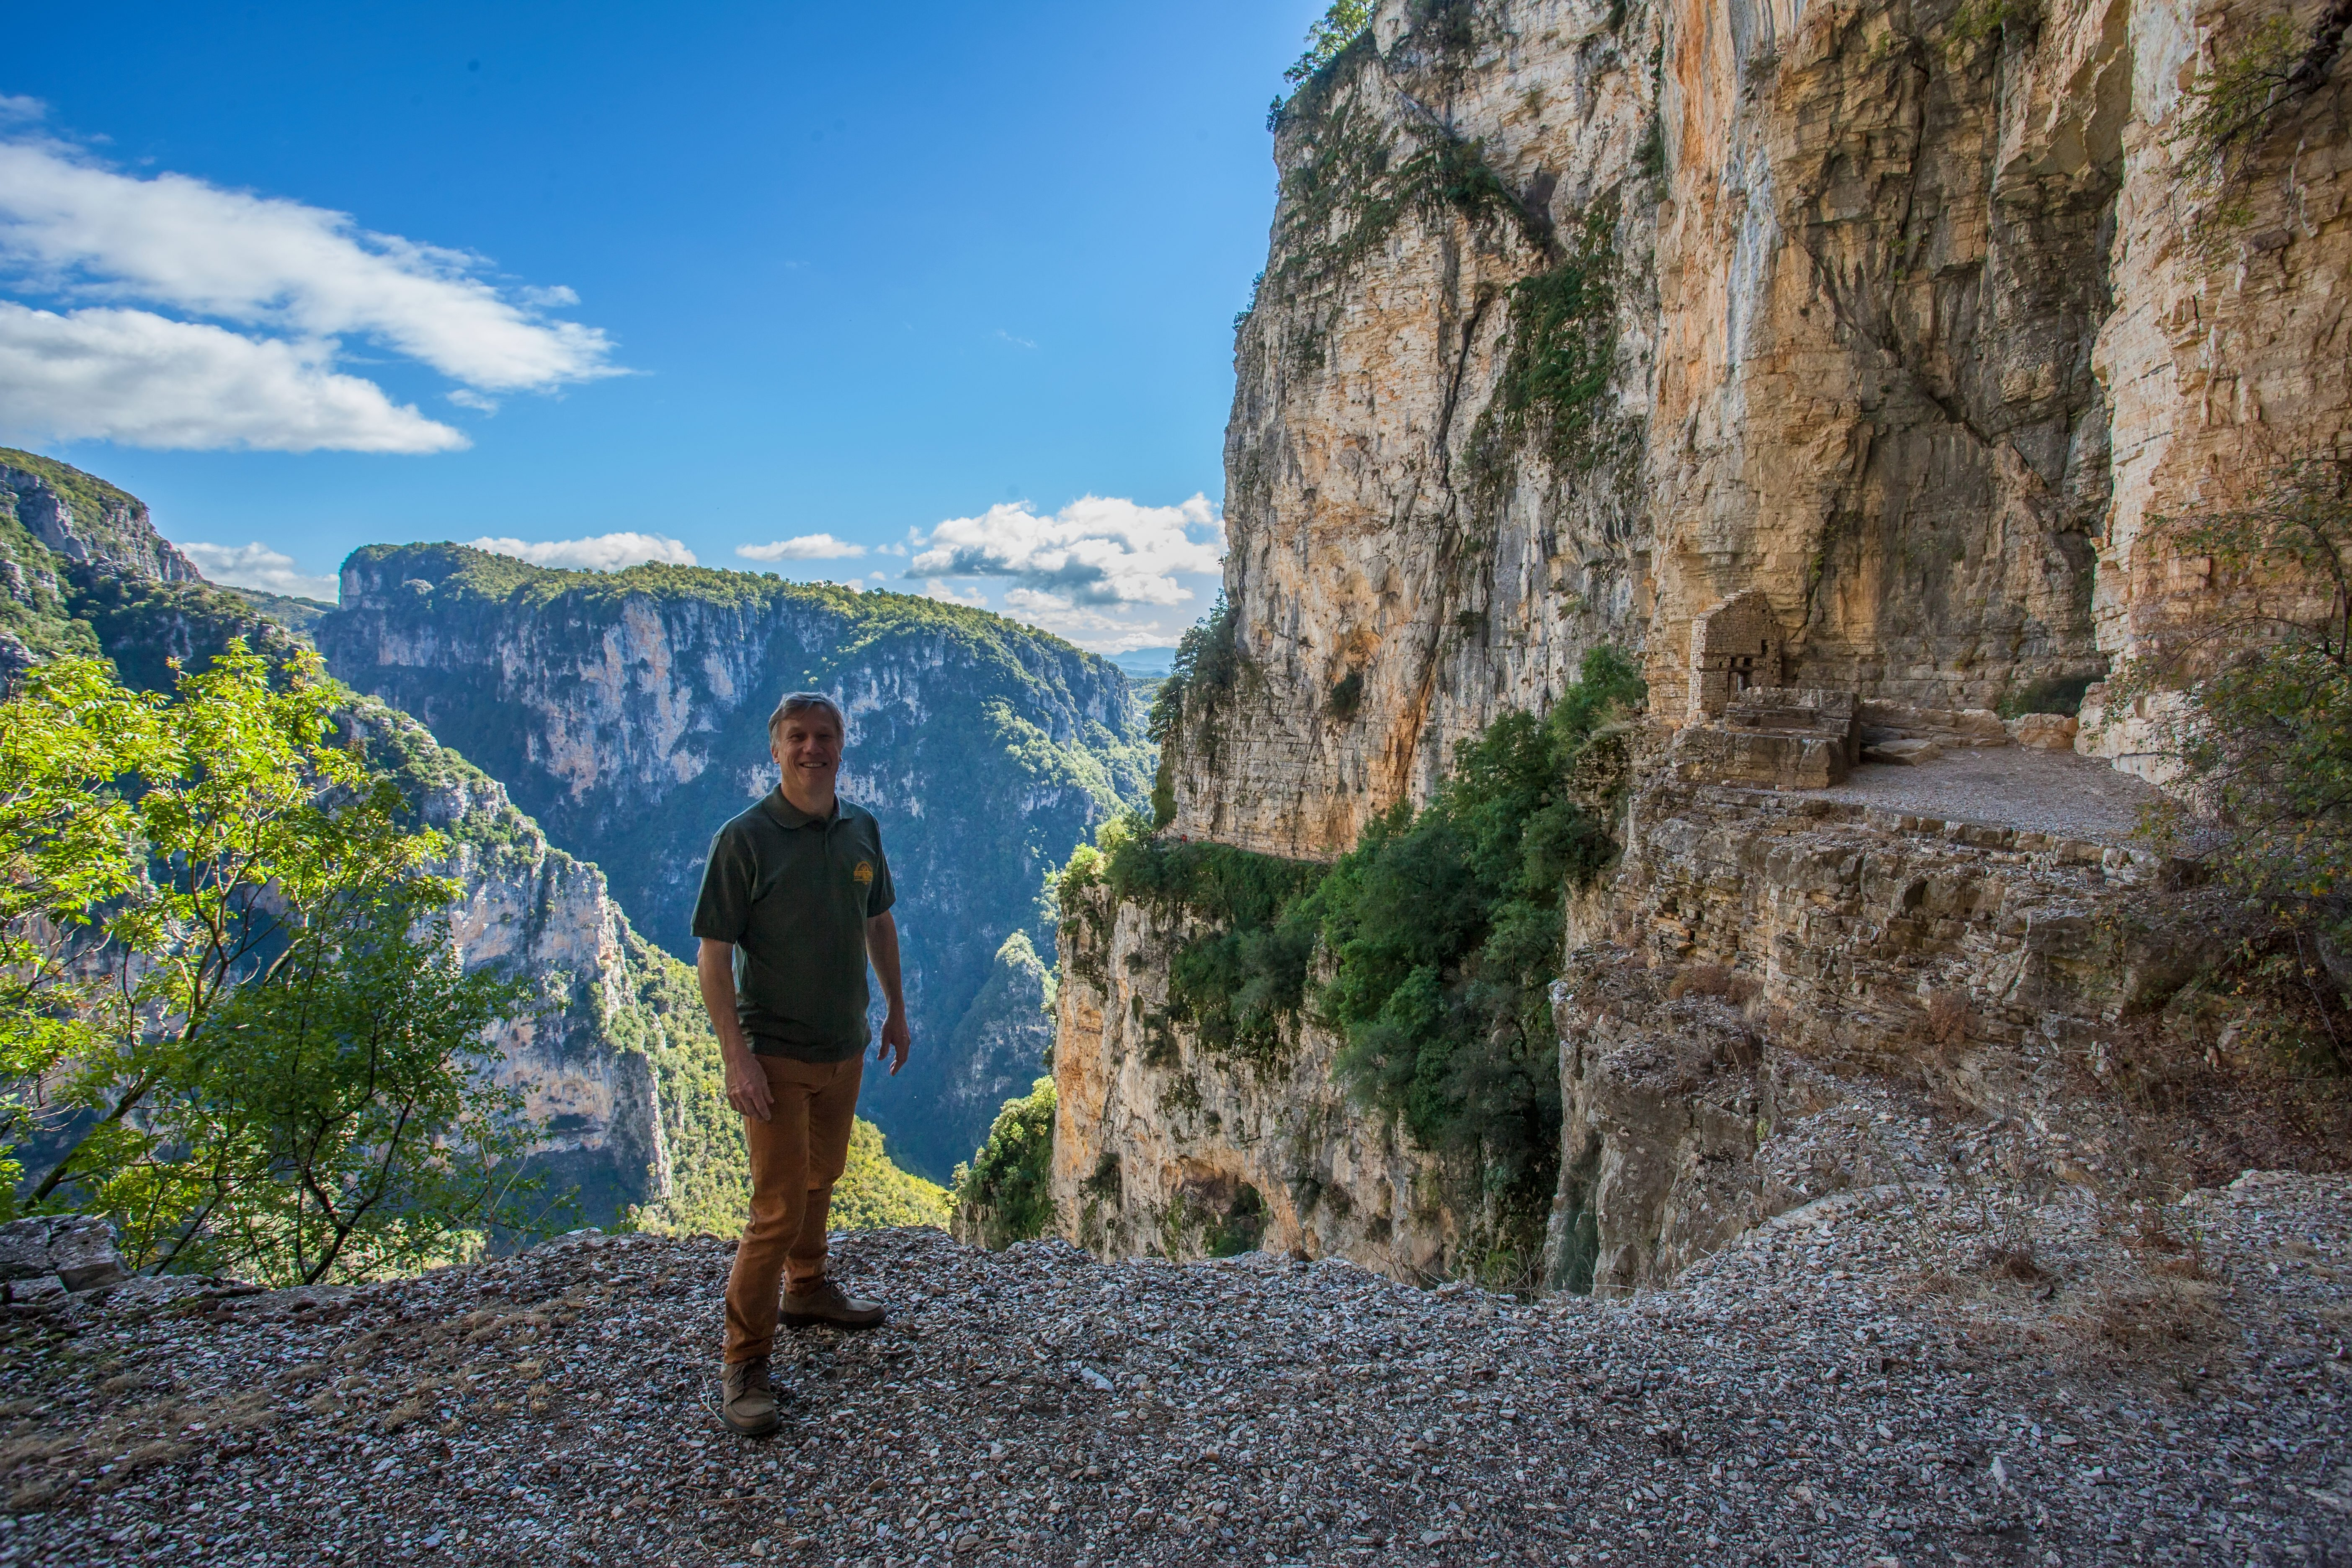 Corfu Trail and Vikos Gorge